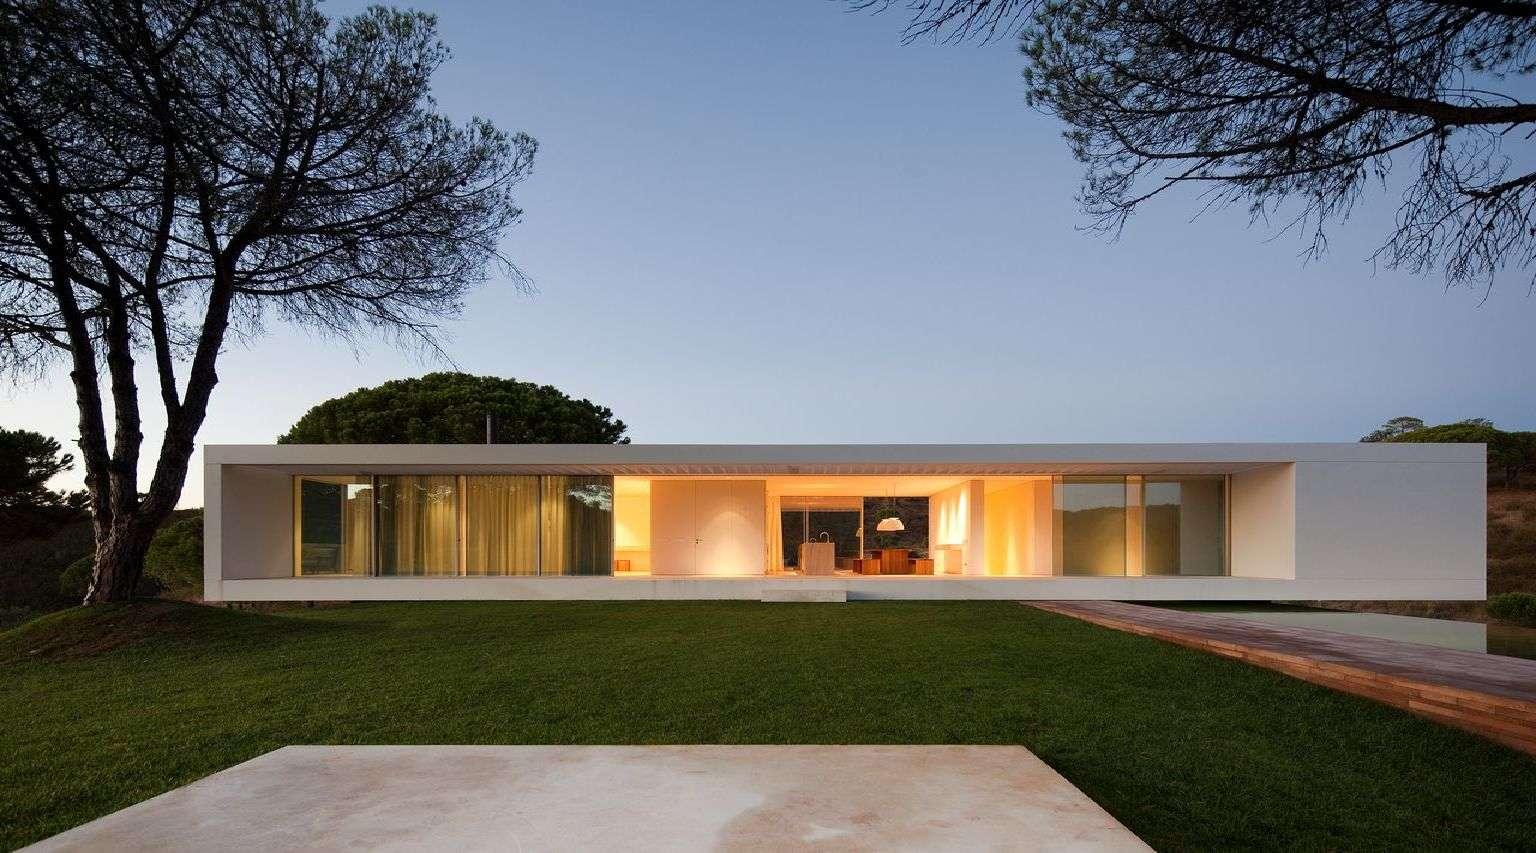 Pedro reis casa a melides floornature for Casa minimalista con alberca